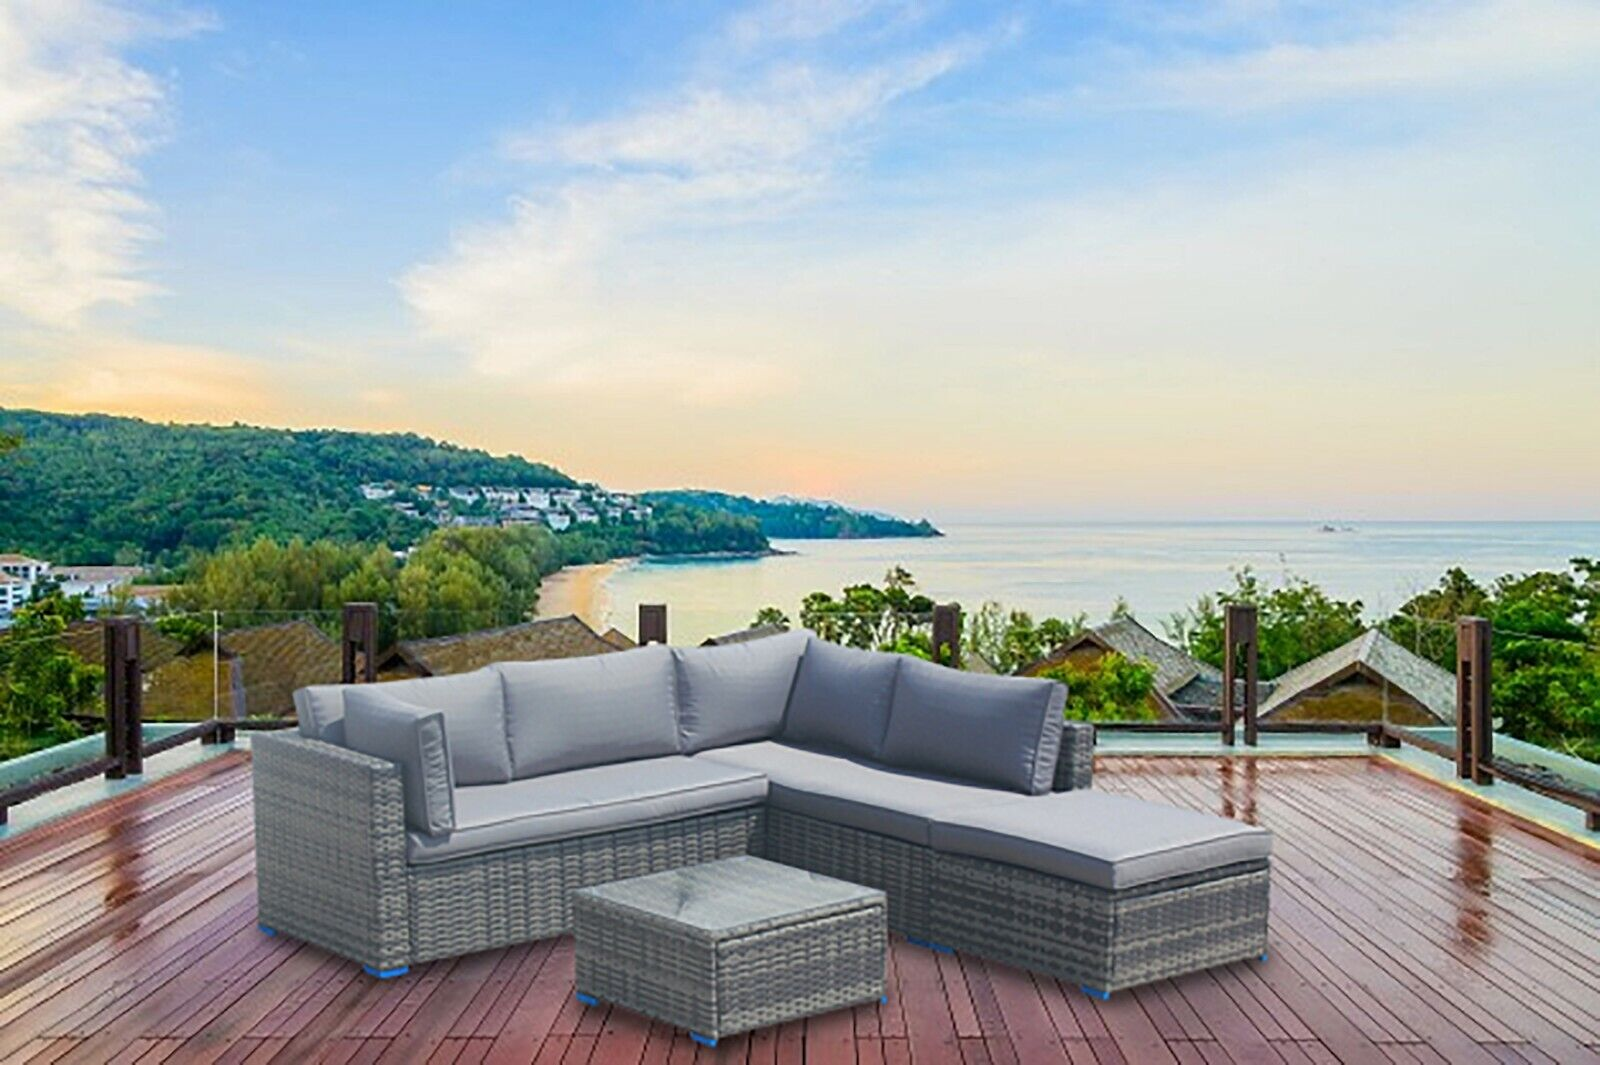 Garden Furniture - Outdoor Rattan Corner Sofa Set Garden Furniture Savcan Patio With Footstool